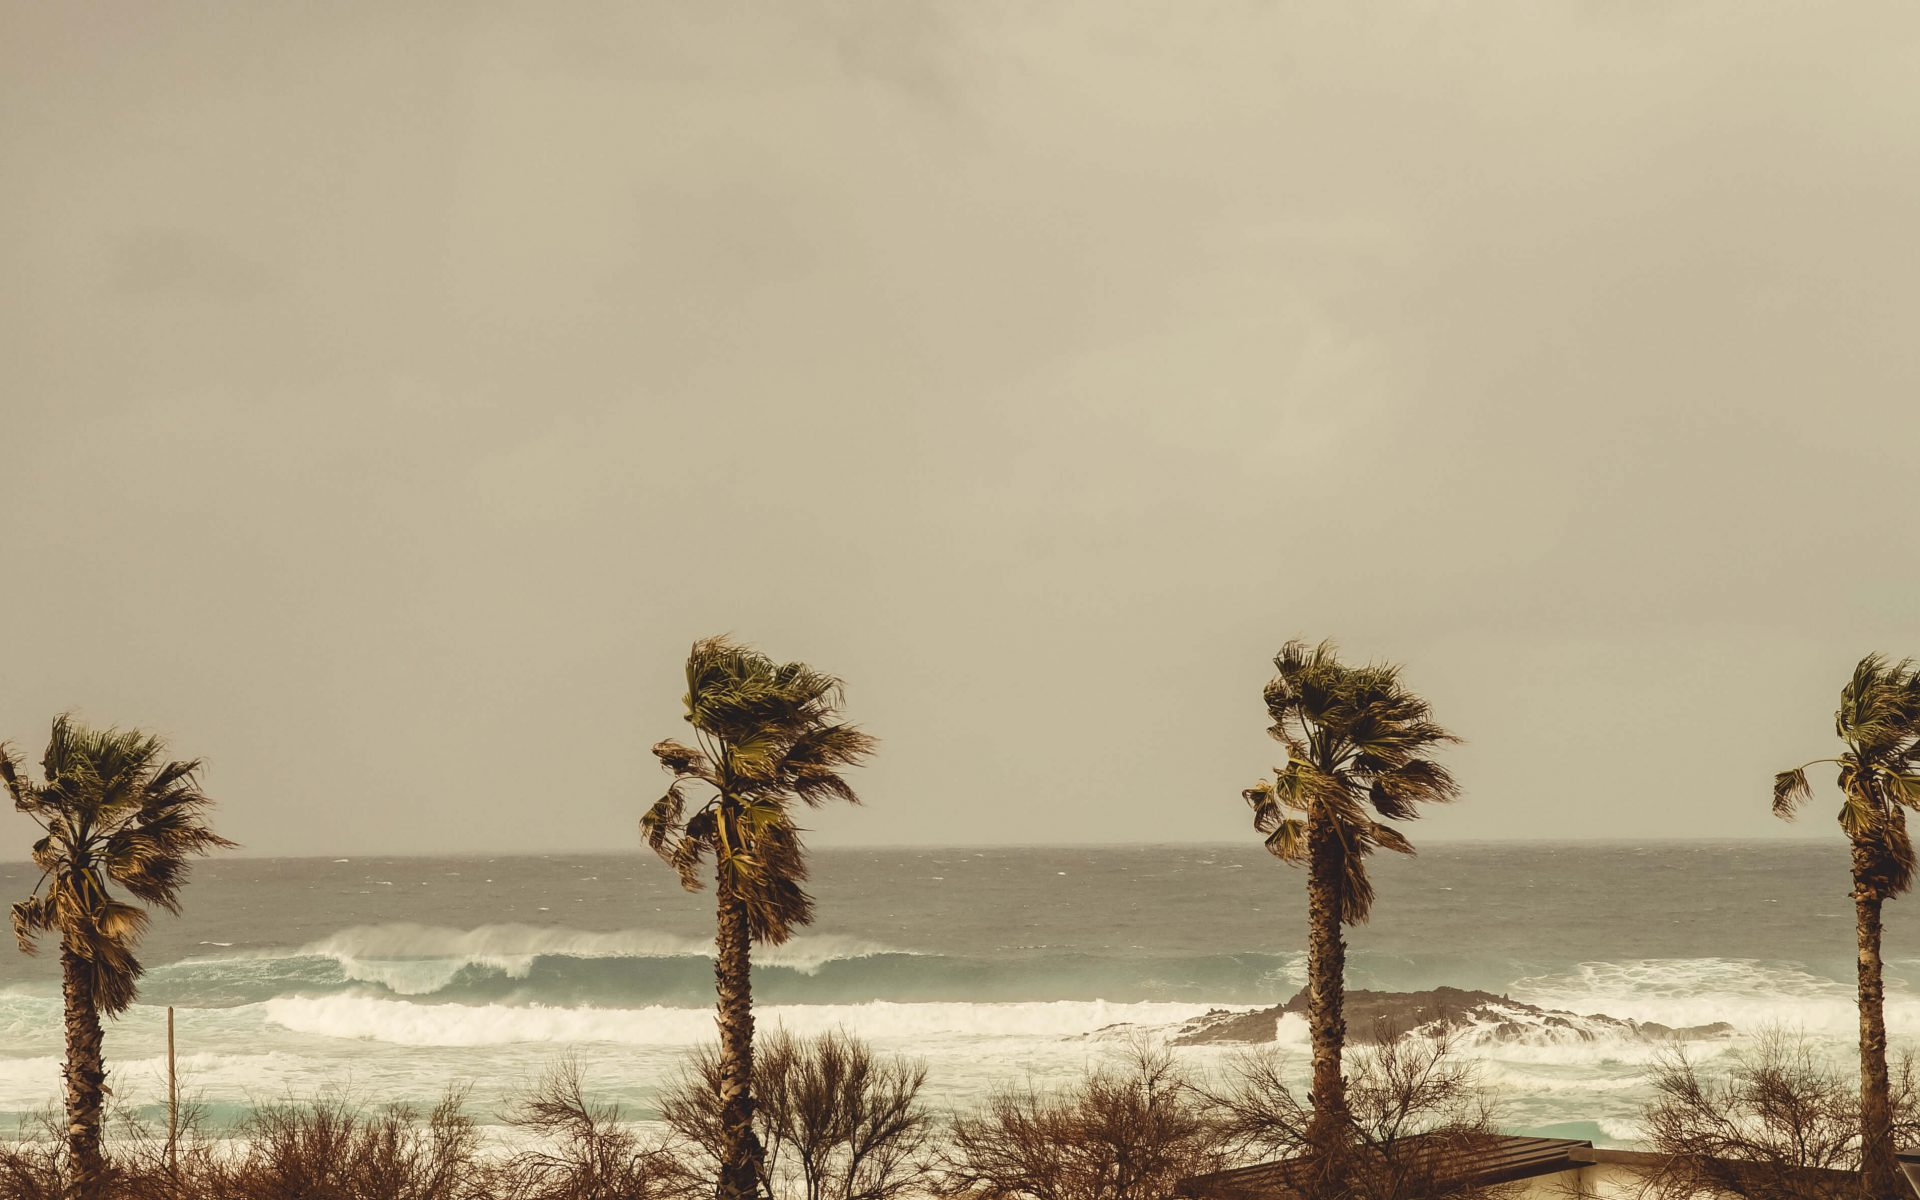 Große, heftige Welle